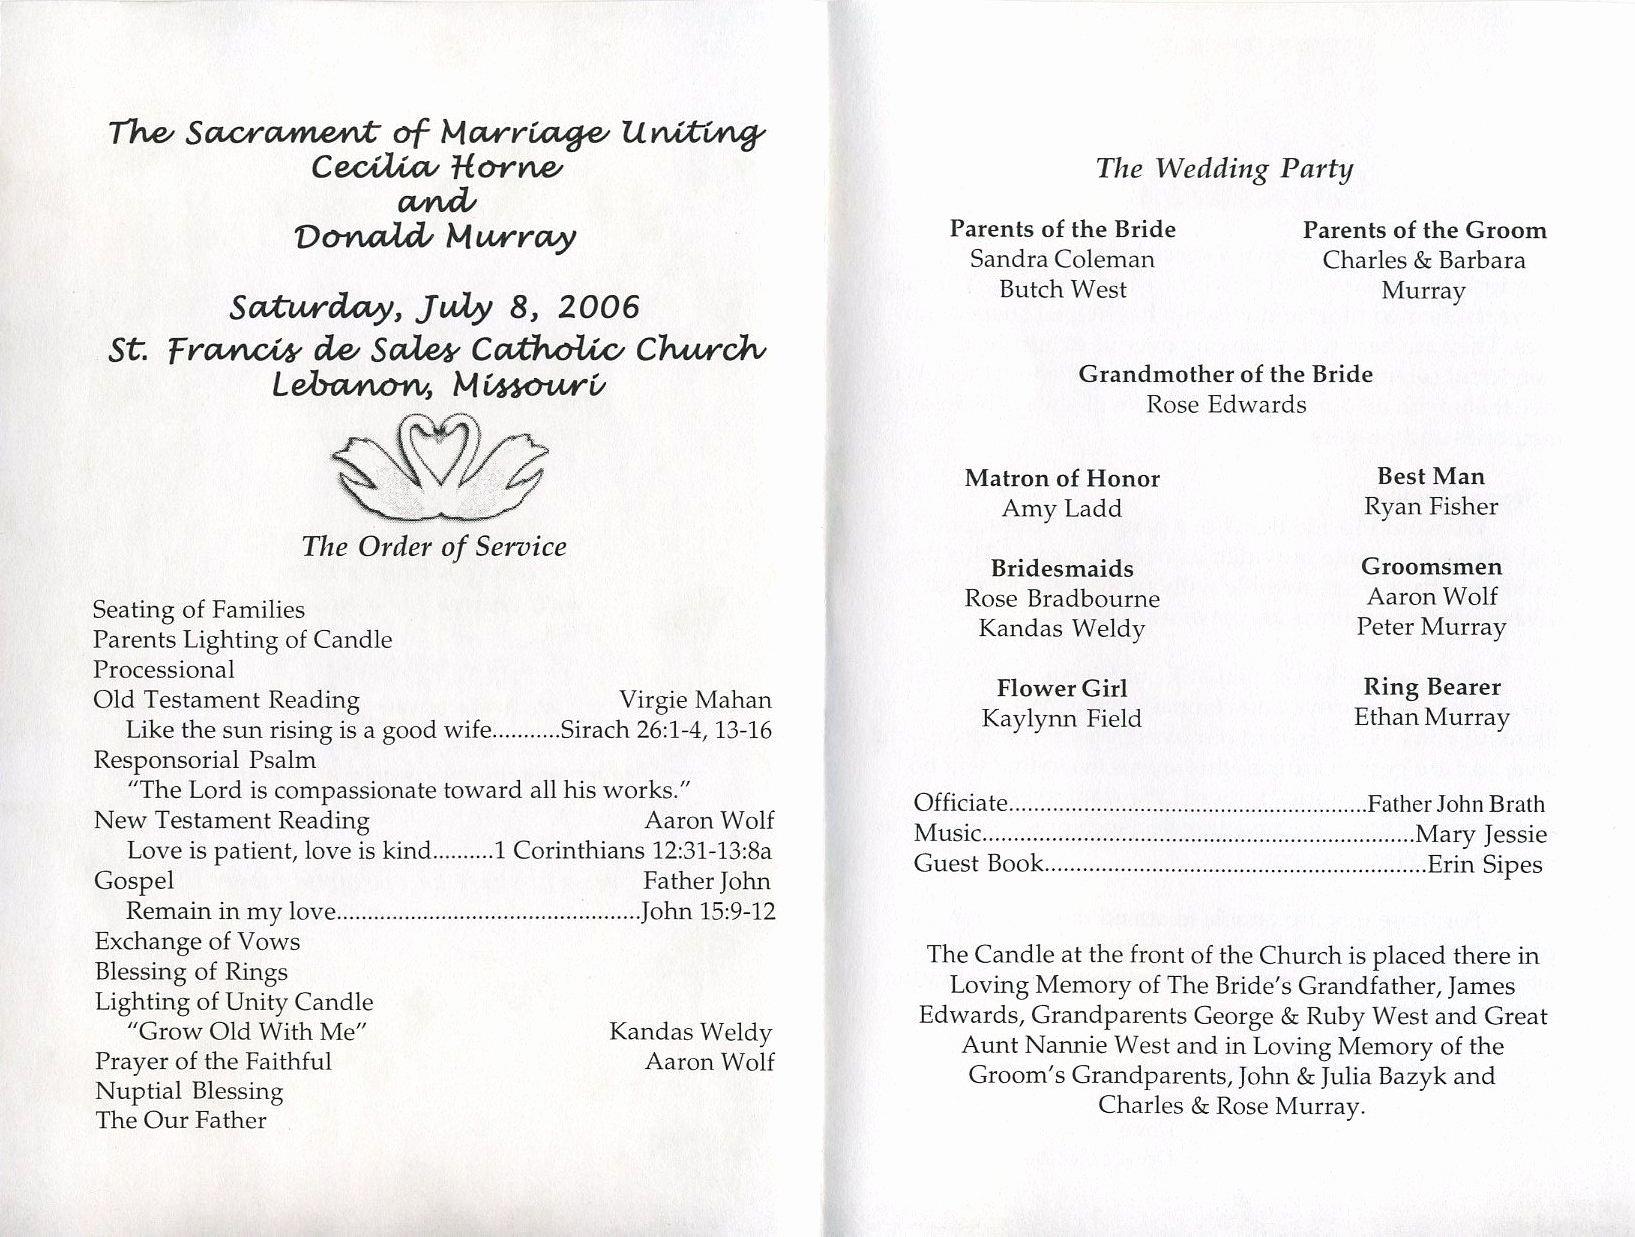 Sample Of Wedding Programme Luxury Free Printable Wedding Programs Templates